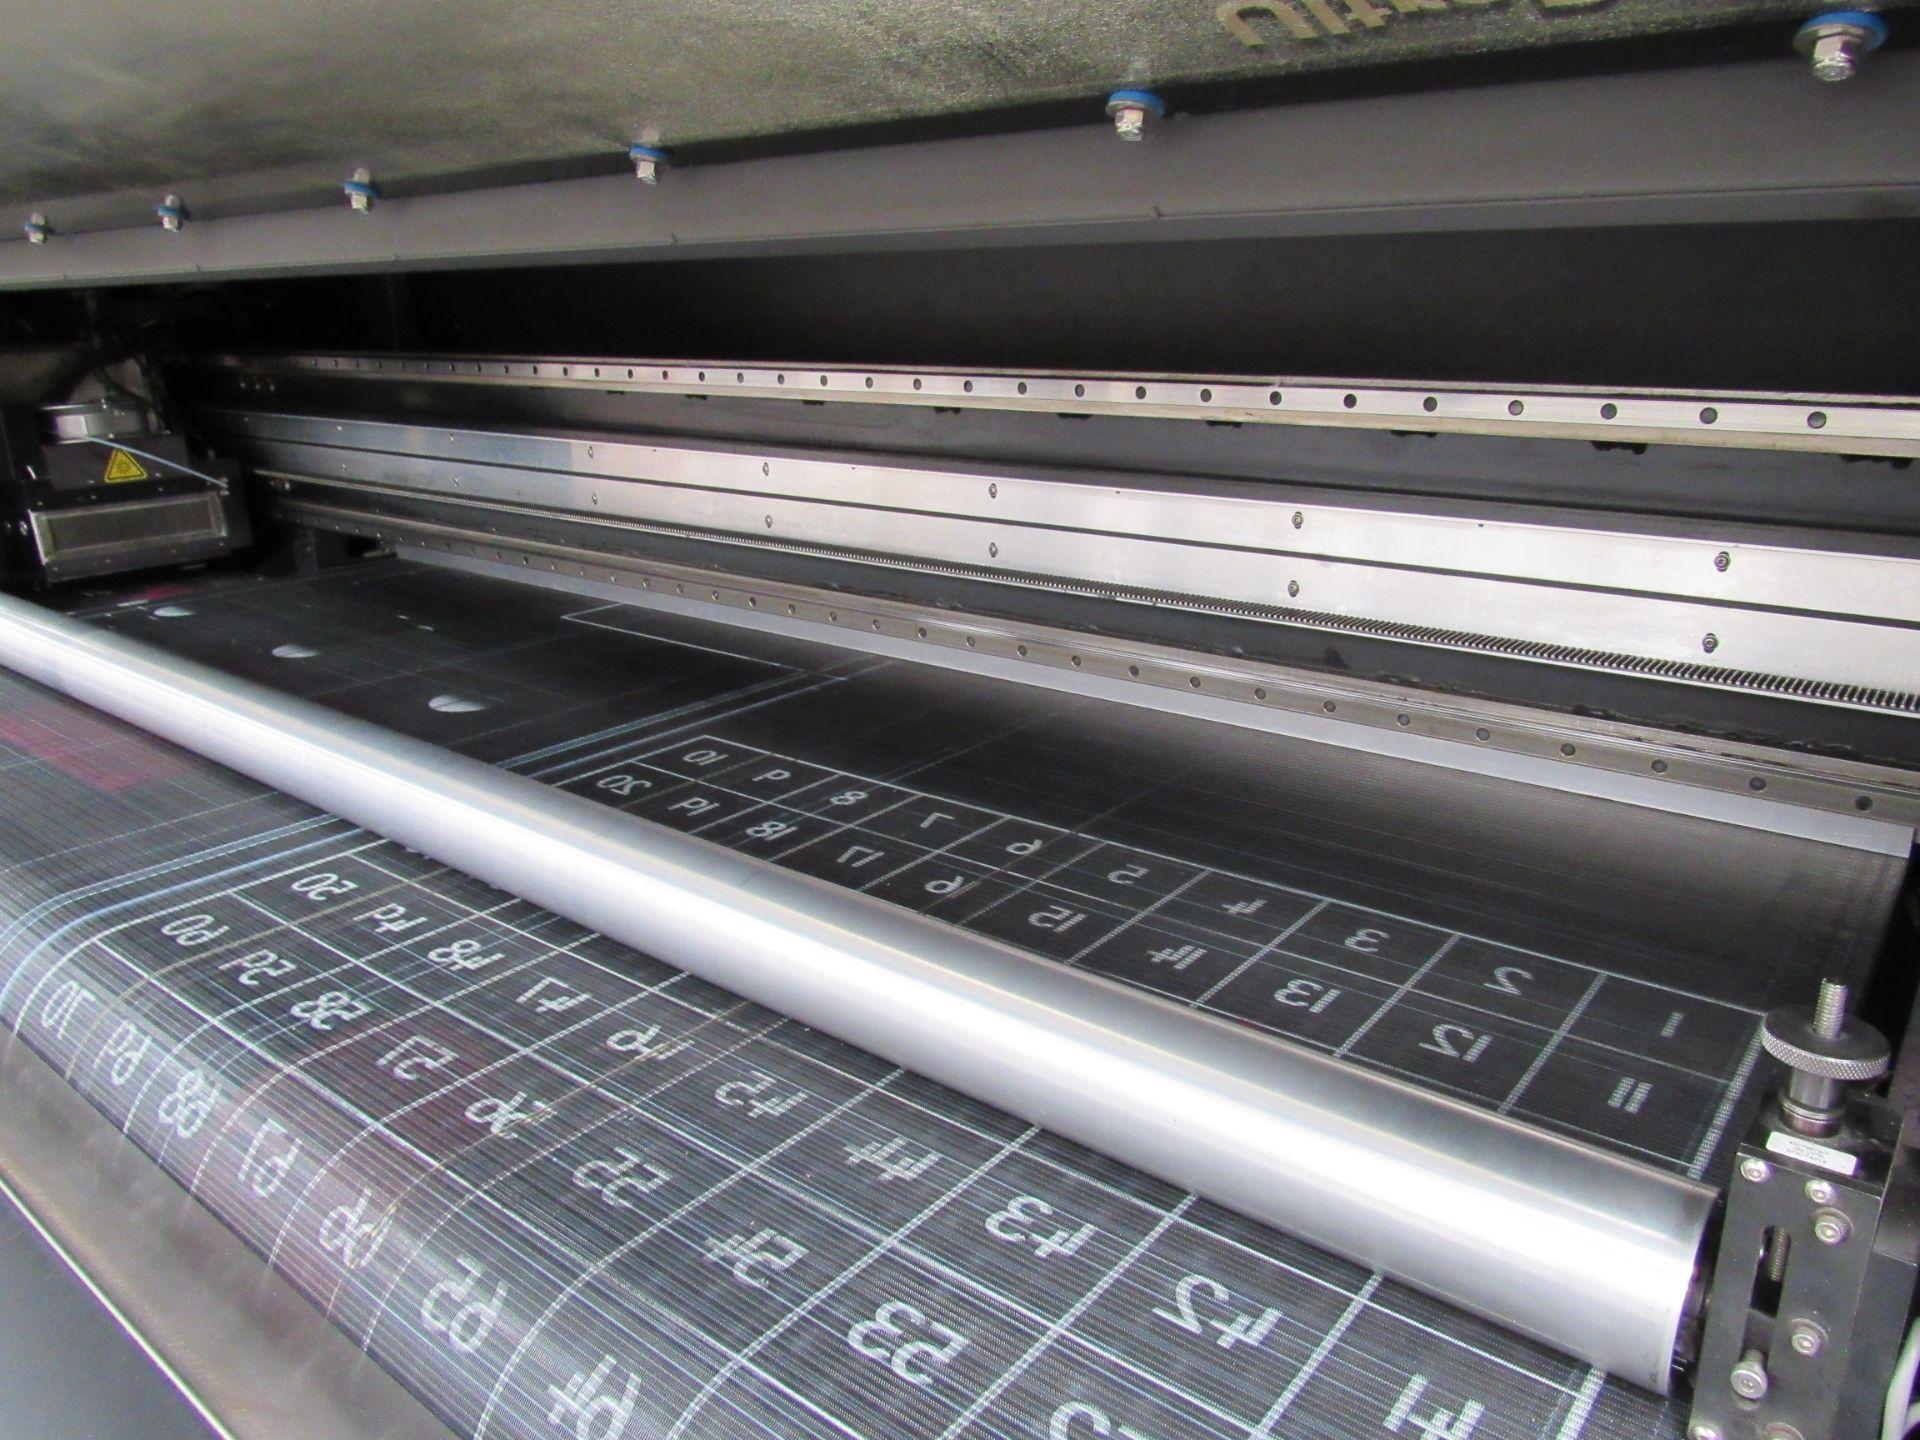 EFI VUTEk H2000 Pro - UltraDrop Technology UV 2m Hybrid Printer, Serial Number 262013, Dec 2014, - Image 8 of 16